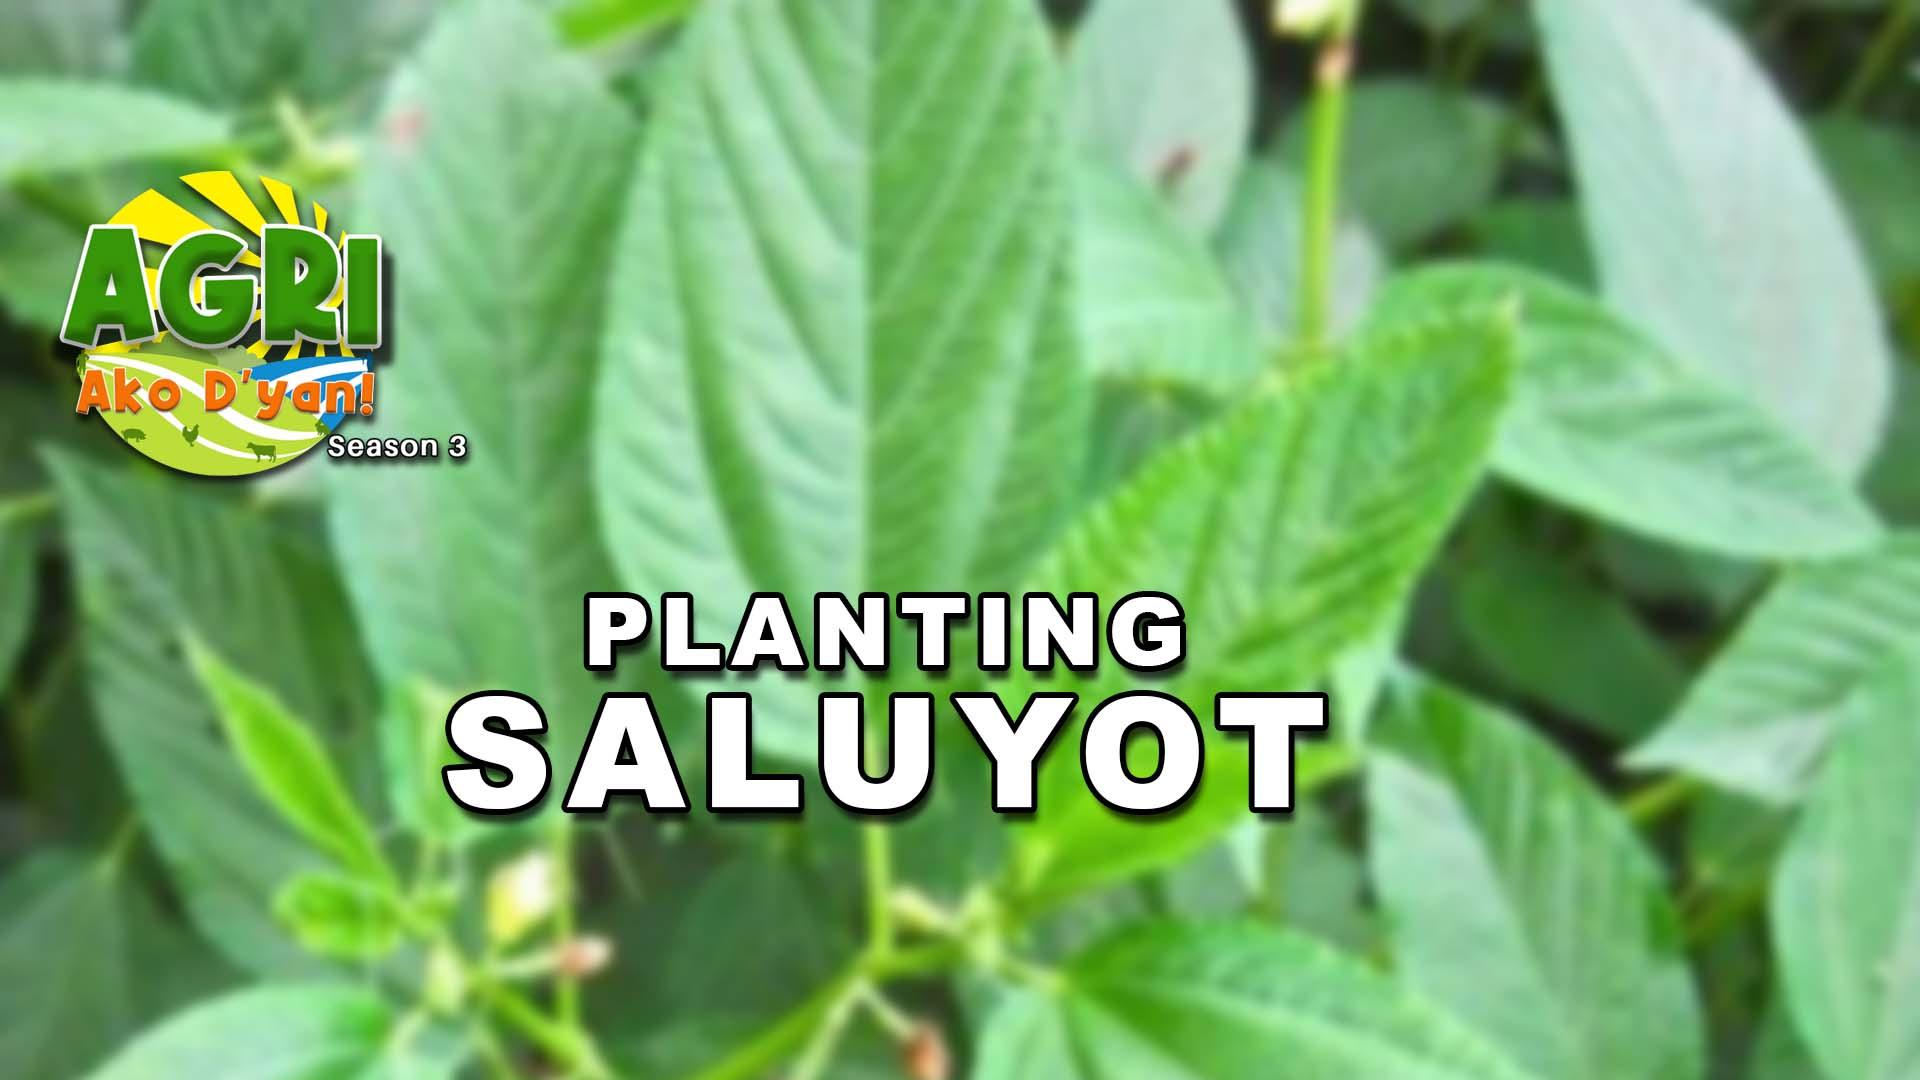 Saluyot Farming